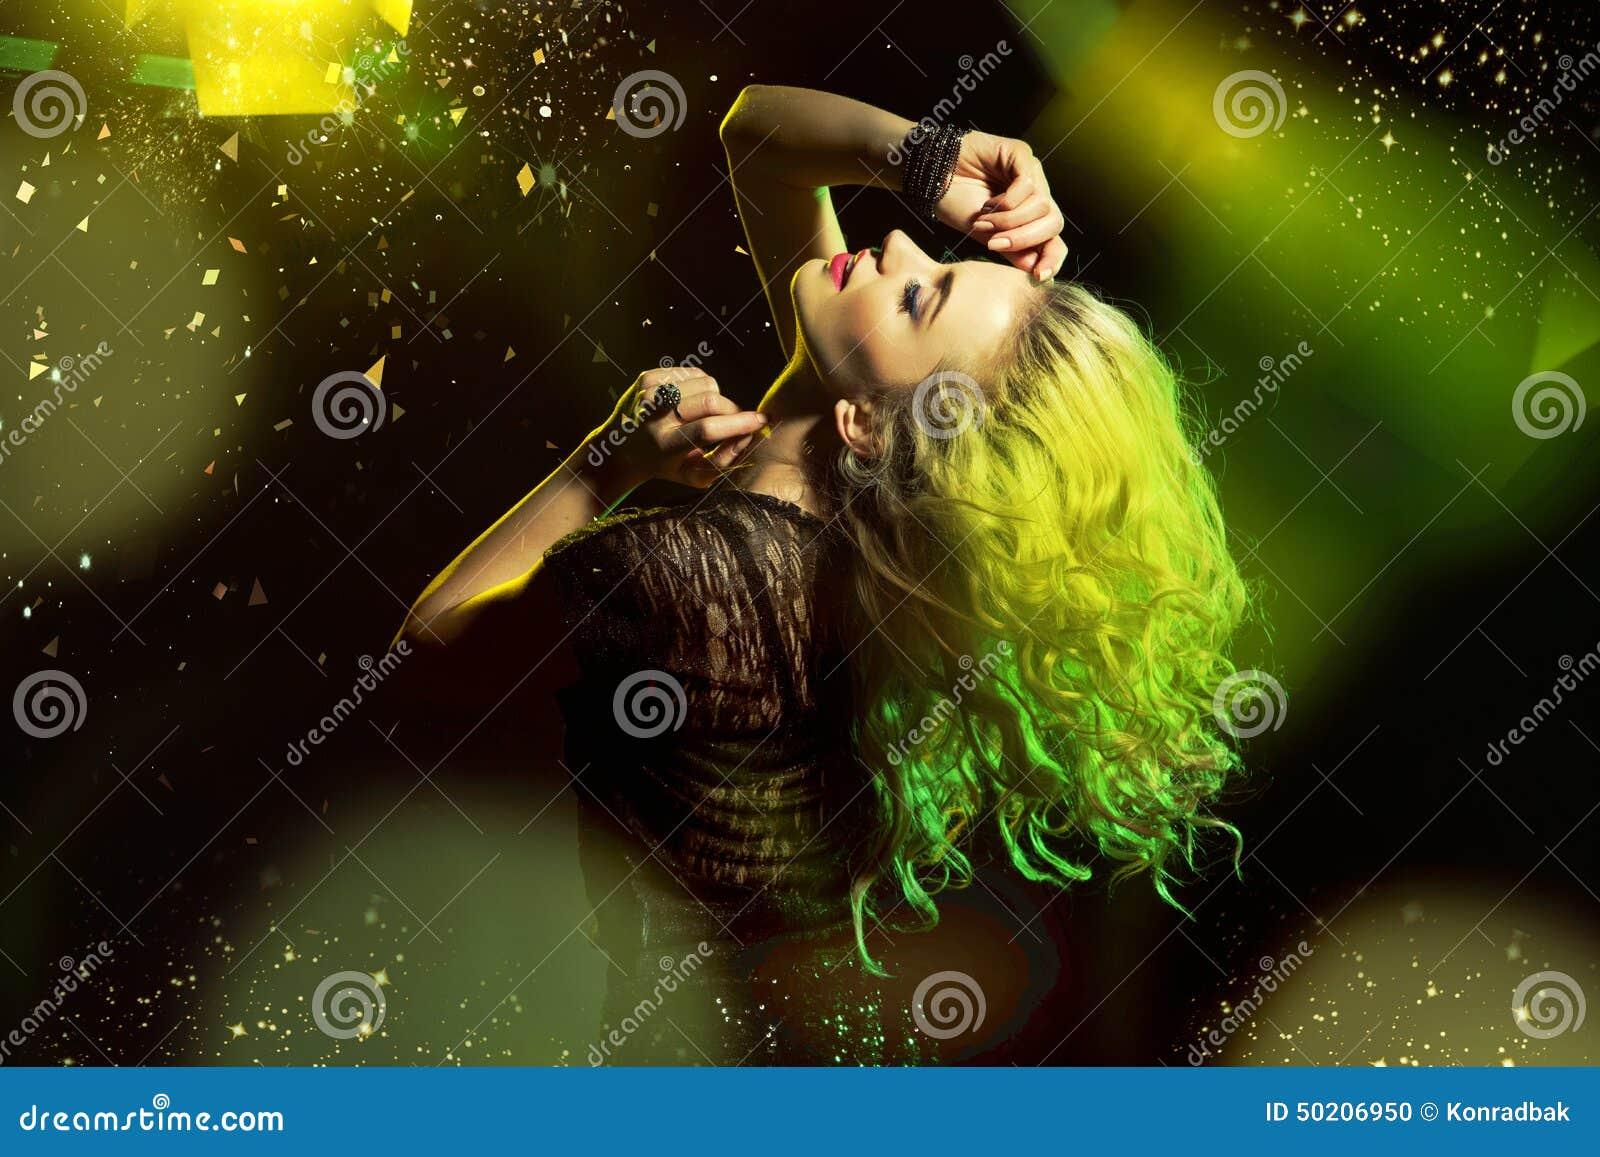 Alluring танцы женщины на танцплощадке